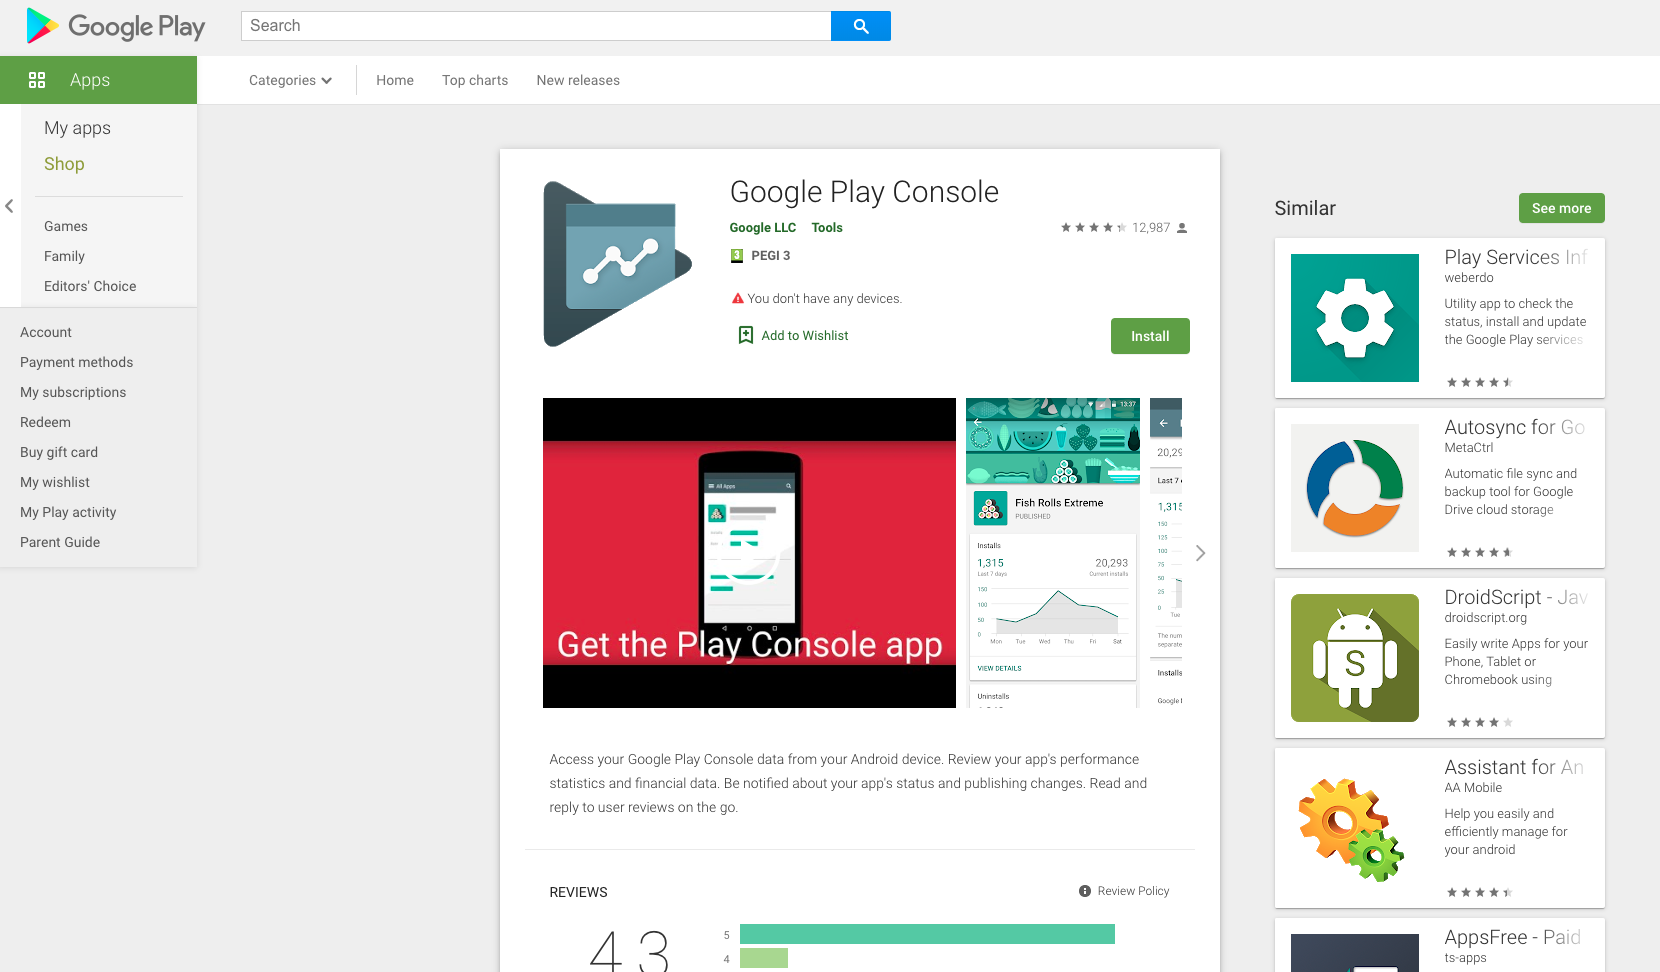 Creazione di un account sviluppatore Google